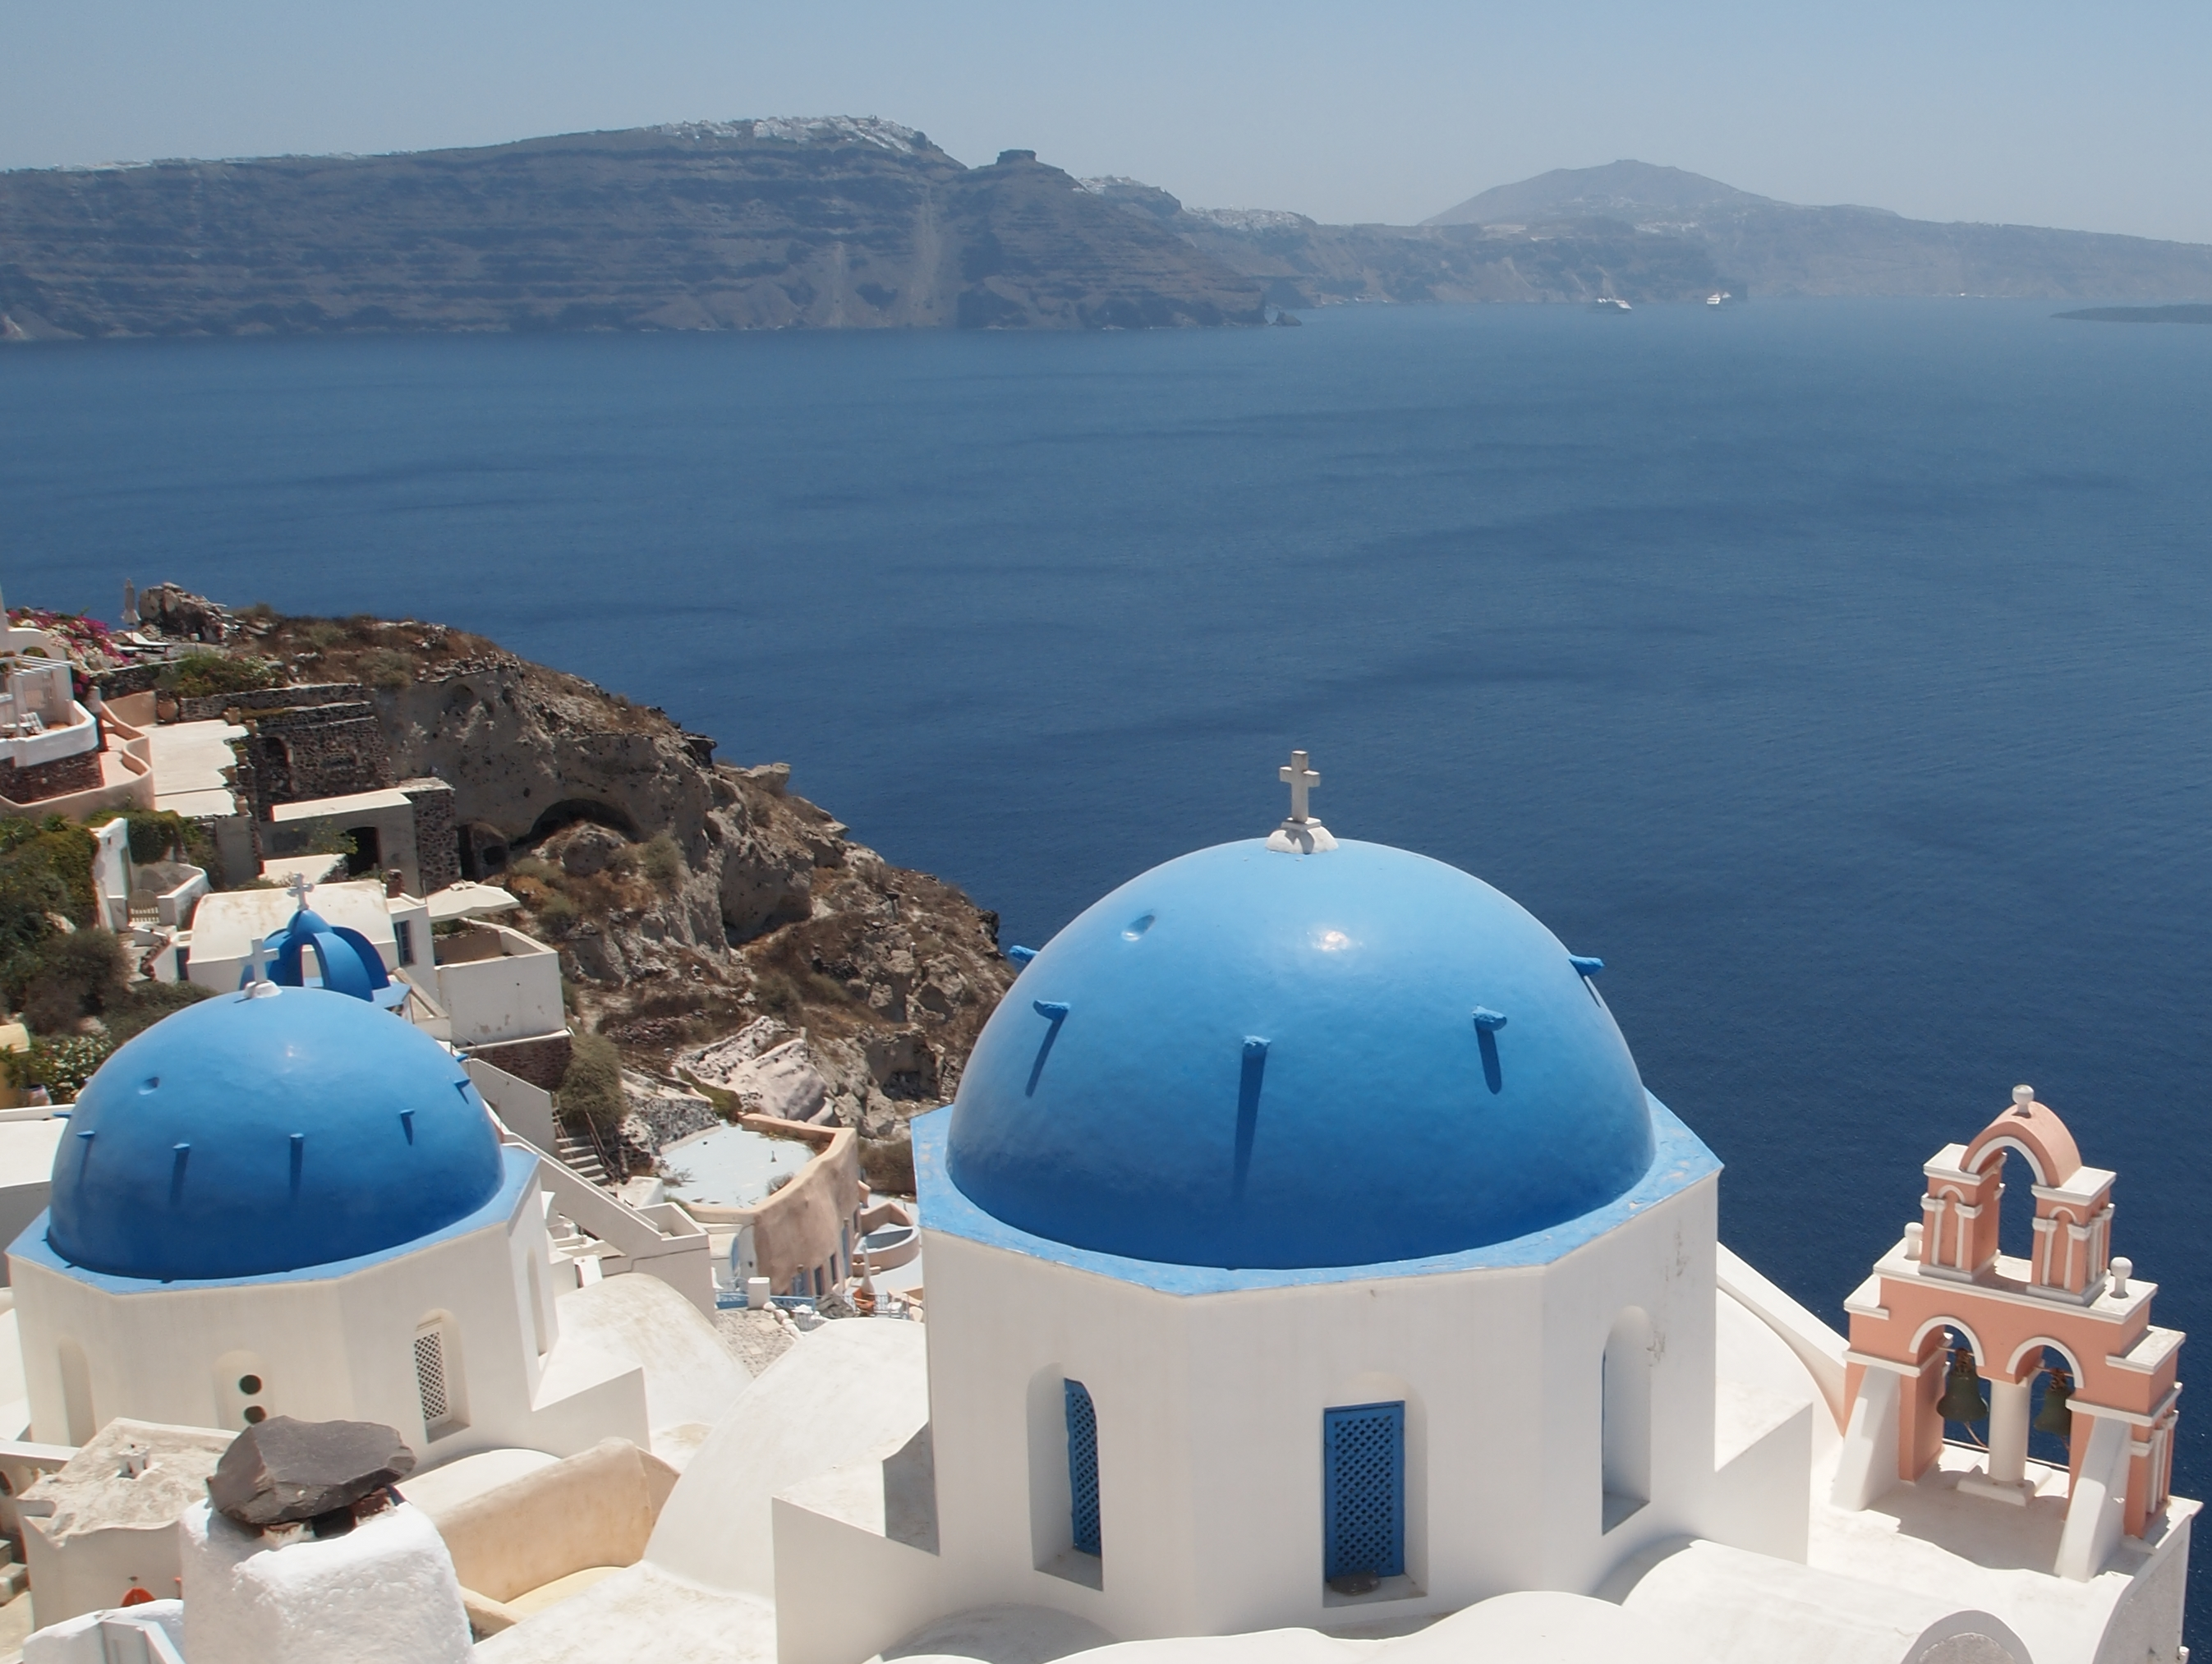 File:Santorini Oia.jpg - Wikimedia Commons